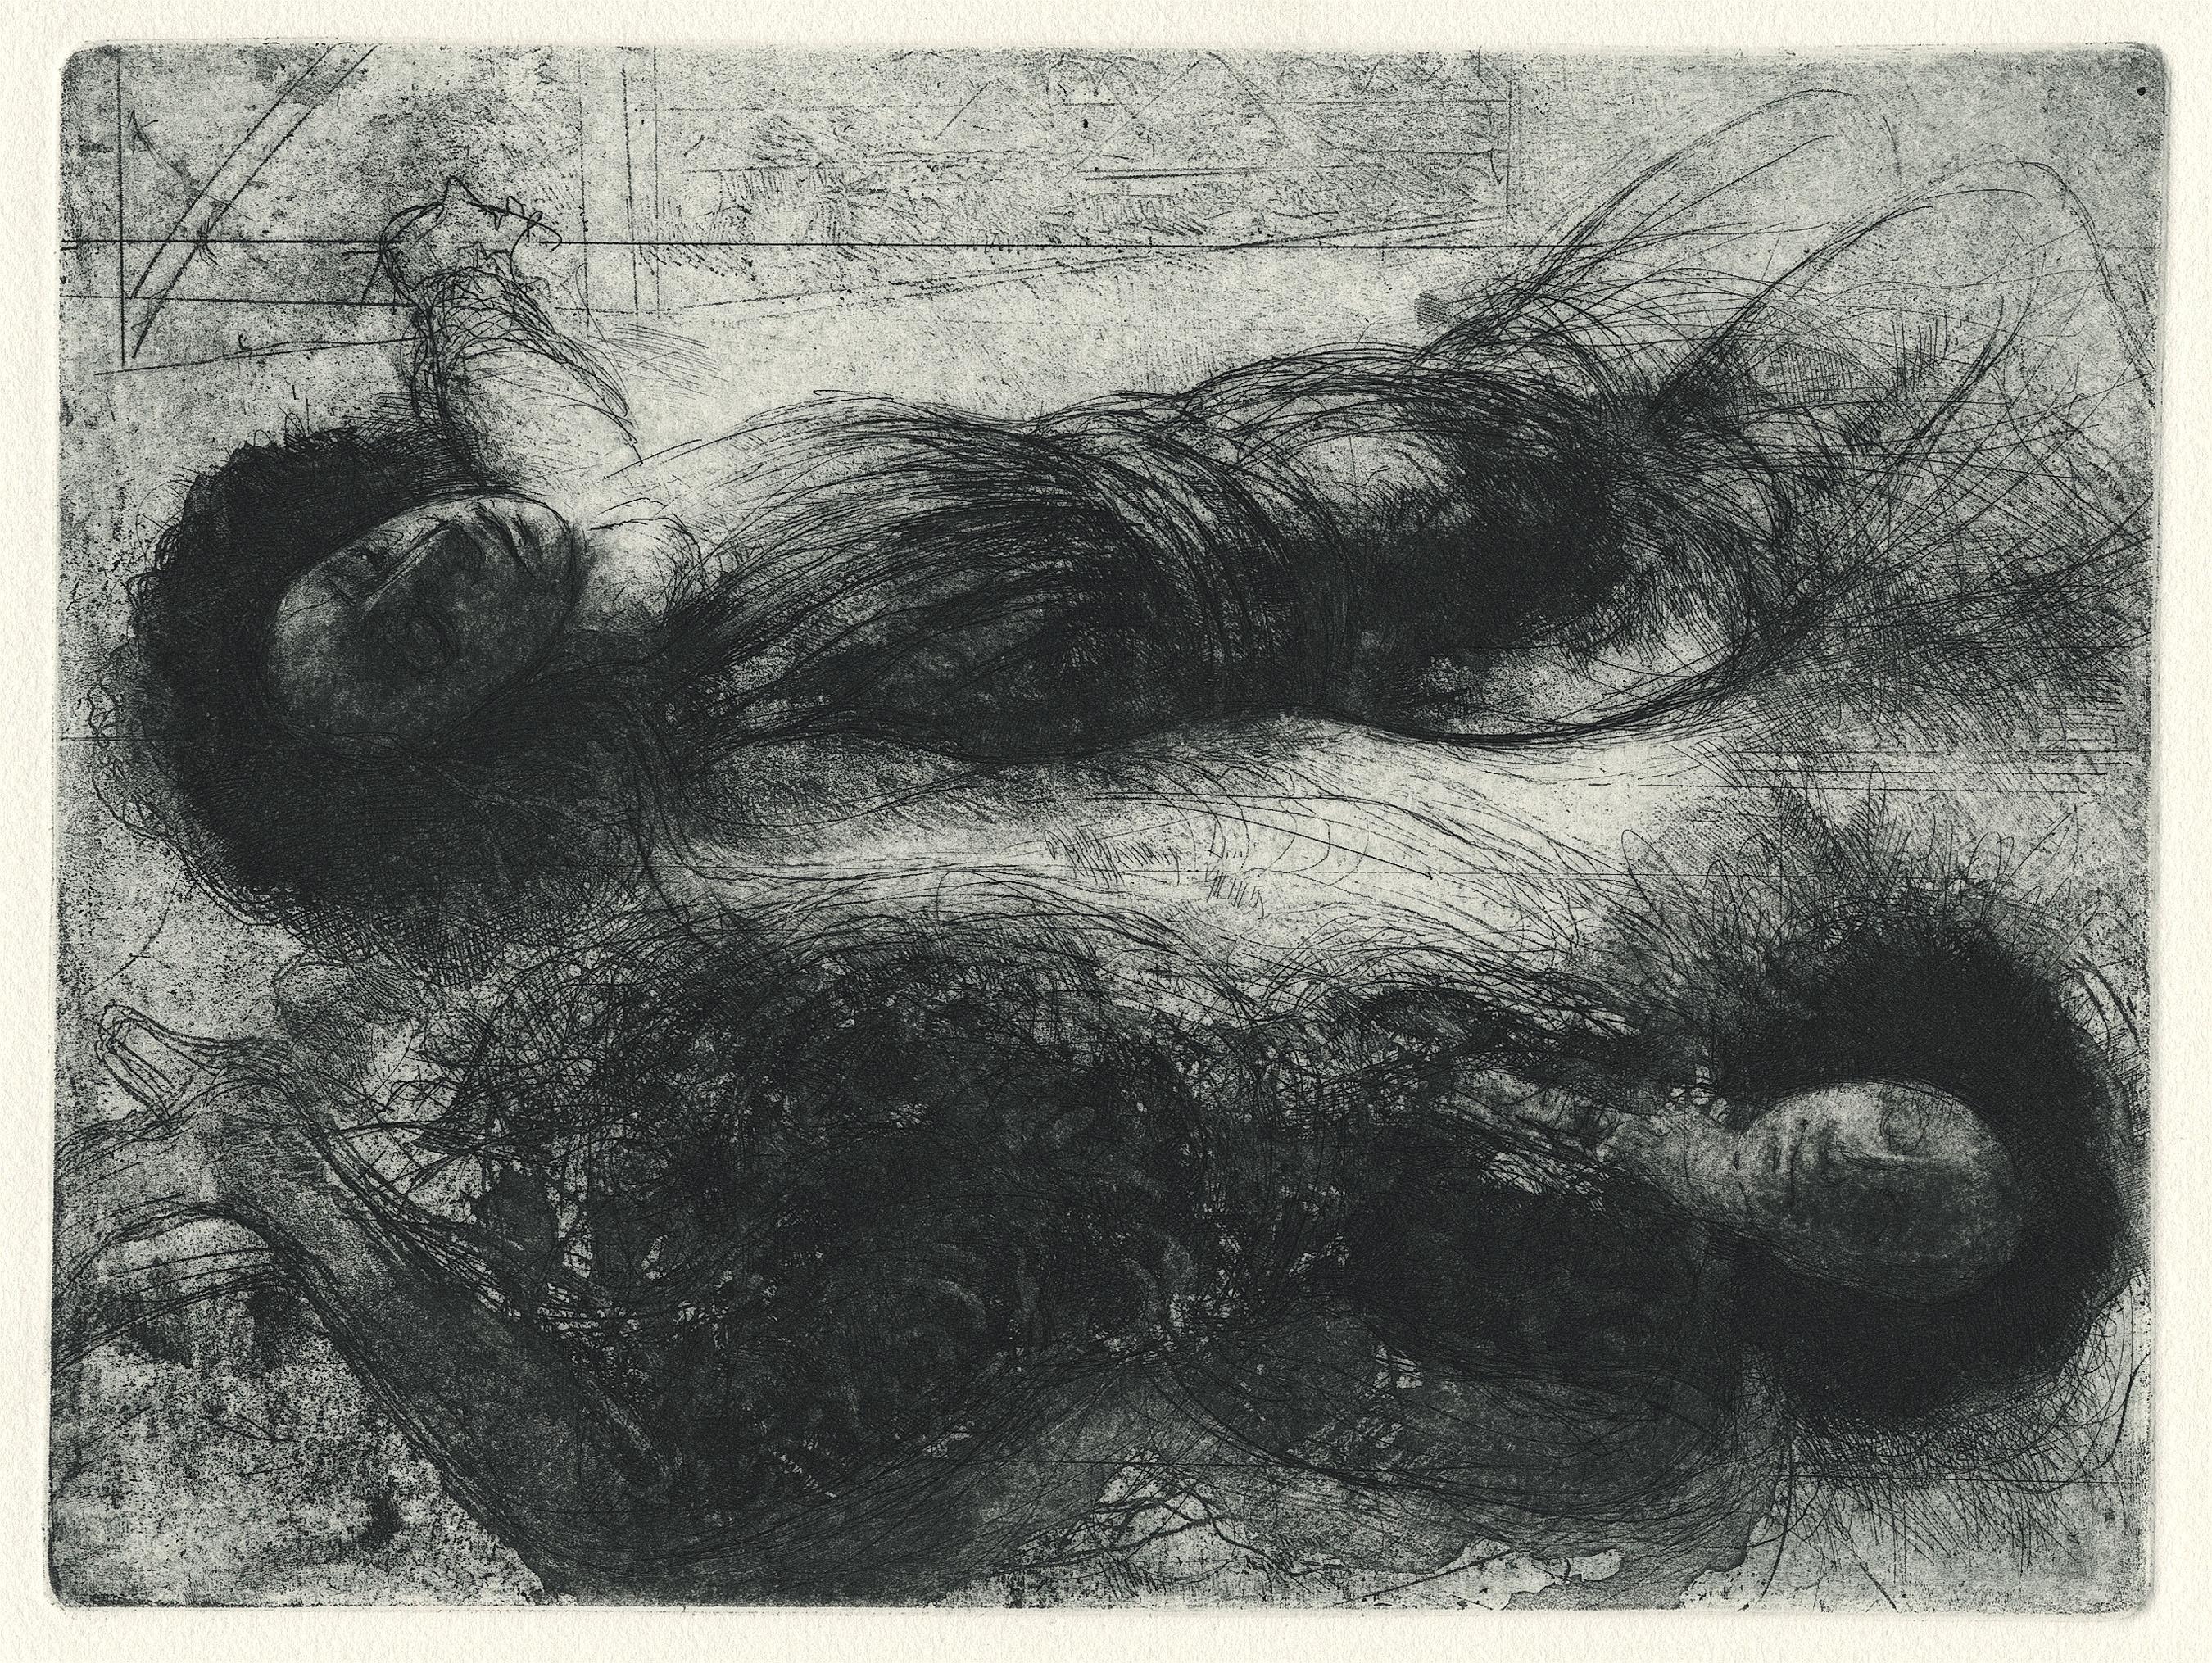 Sleeper by Bruce Muirhead